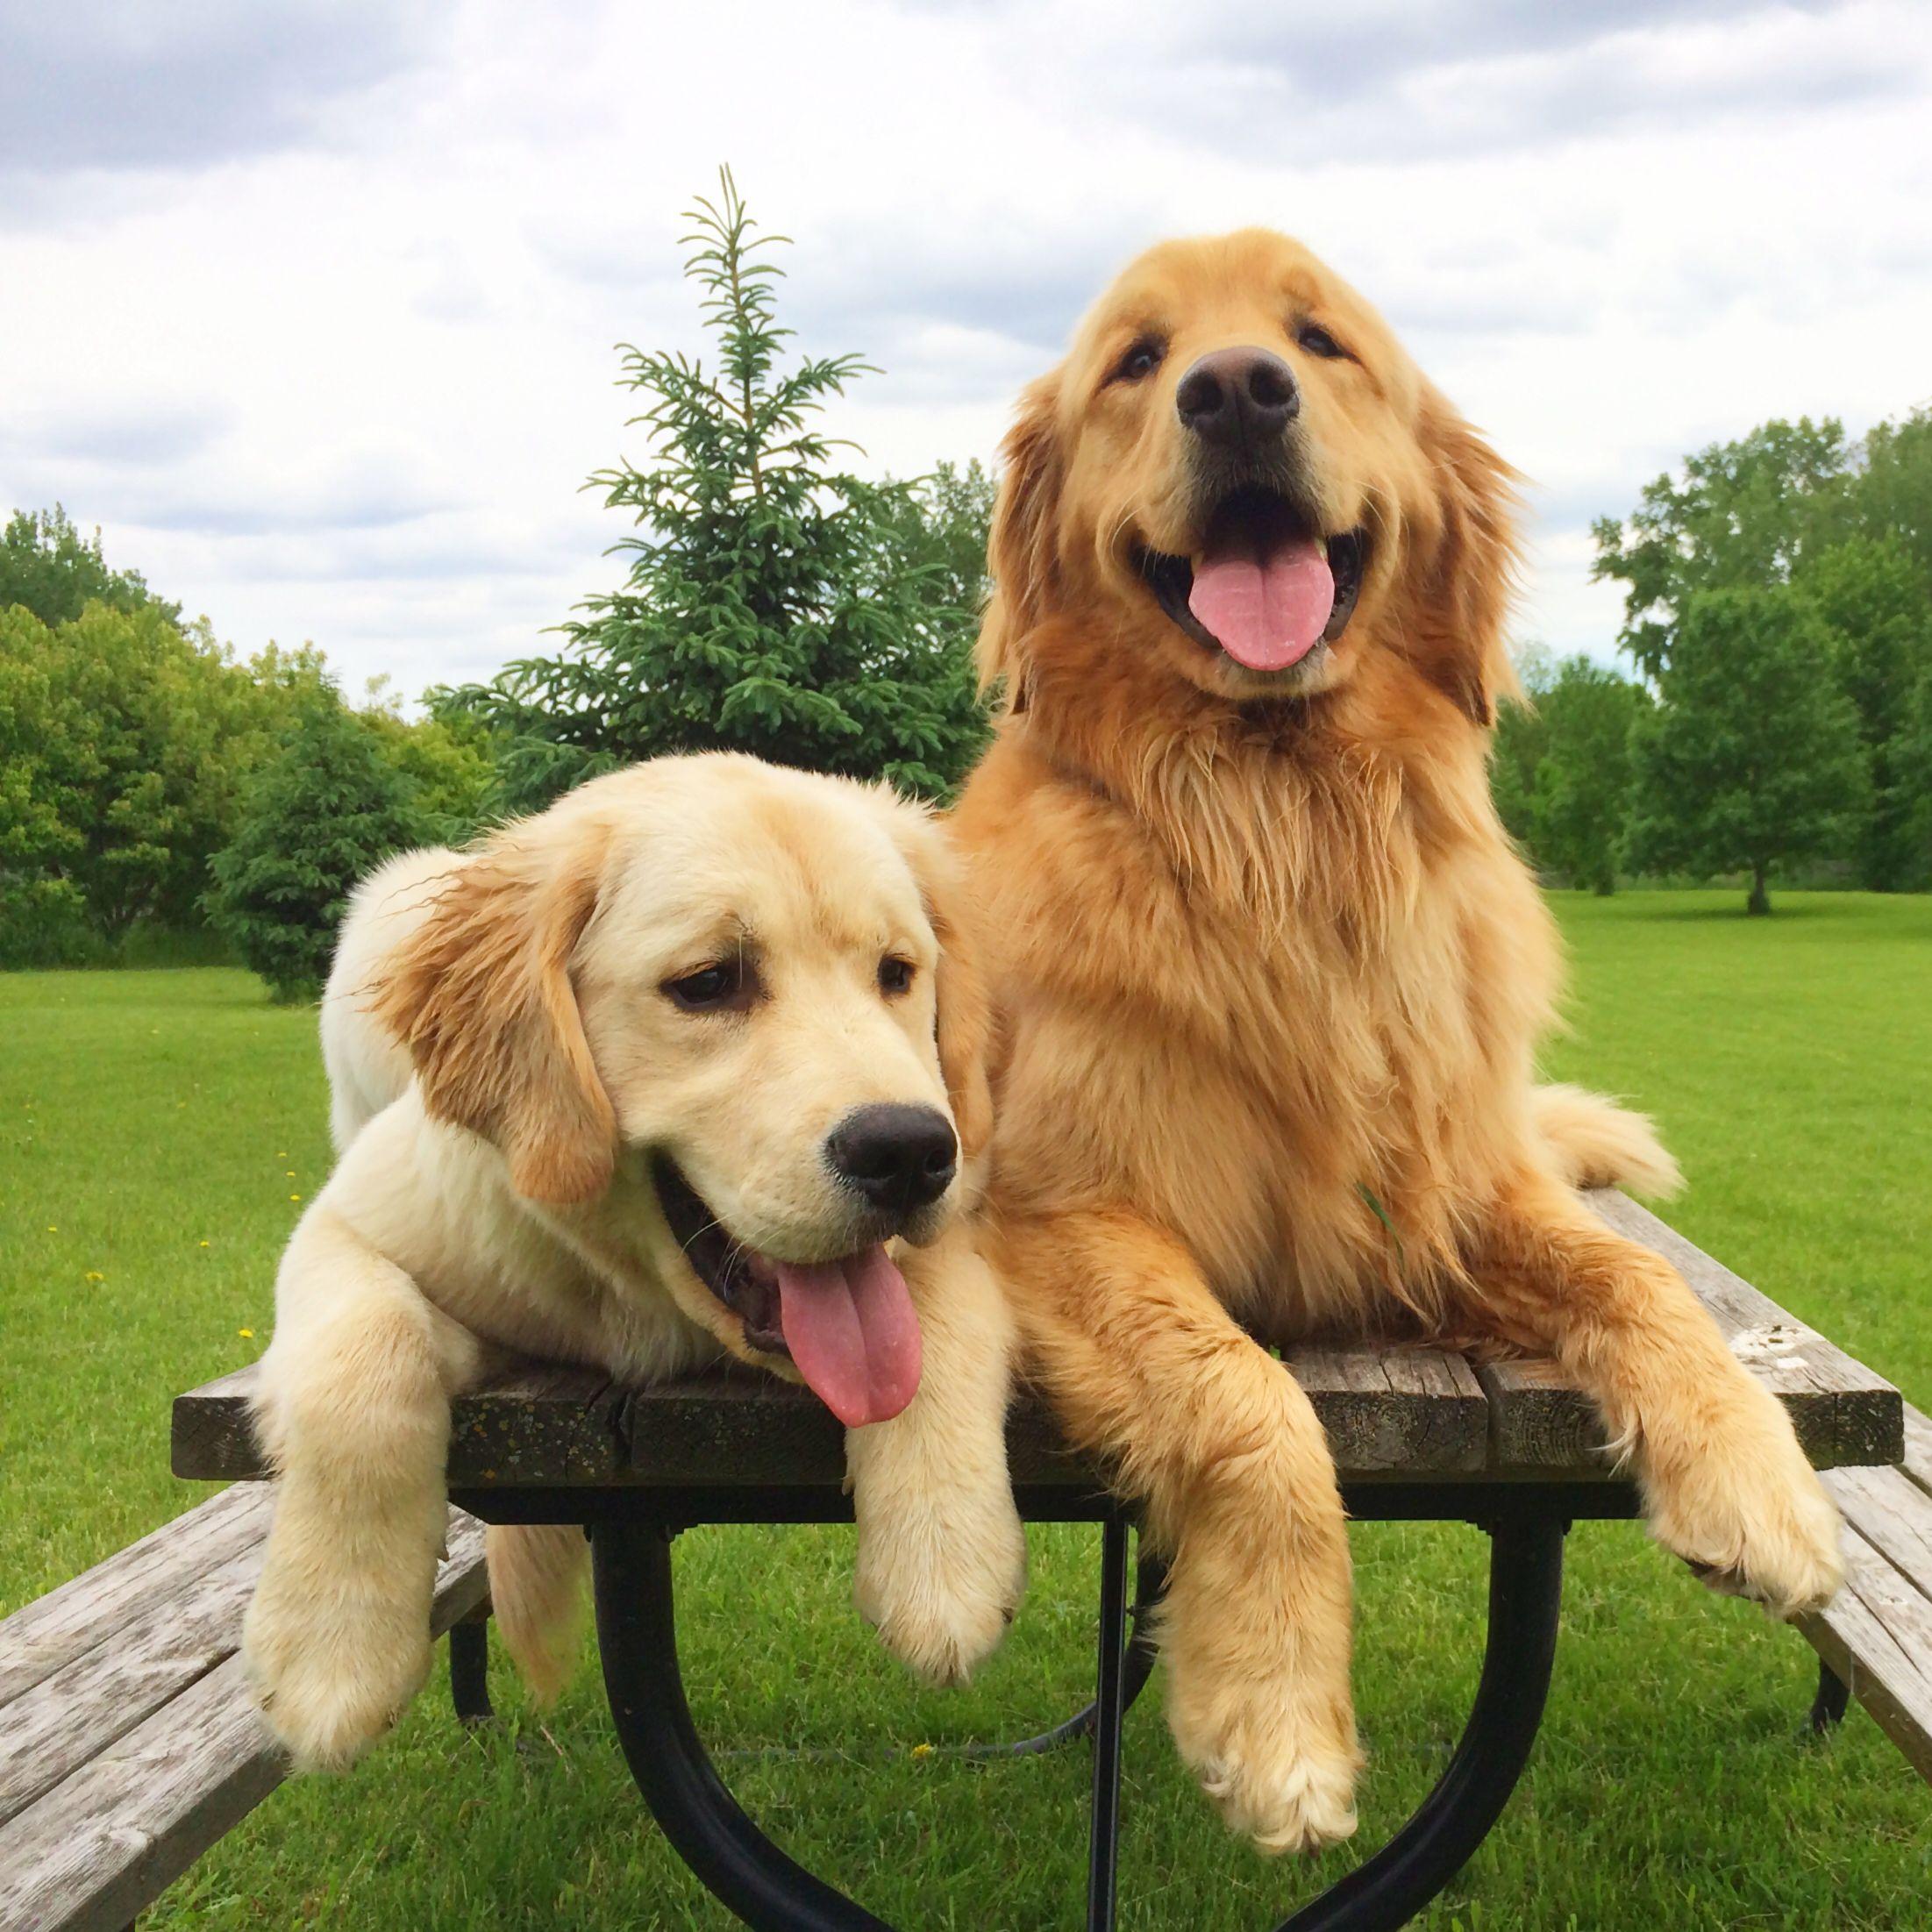 Picnic Time Dogs Golden Retriever Dog Breeds Dogs